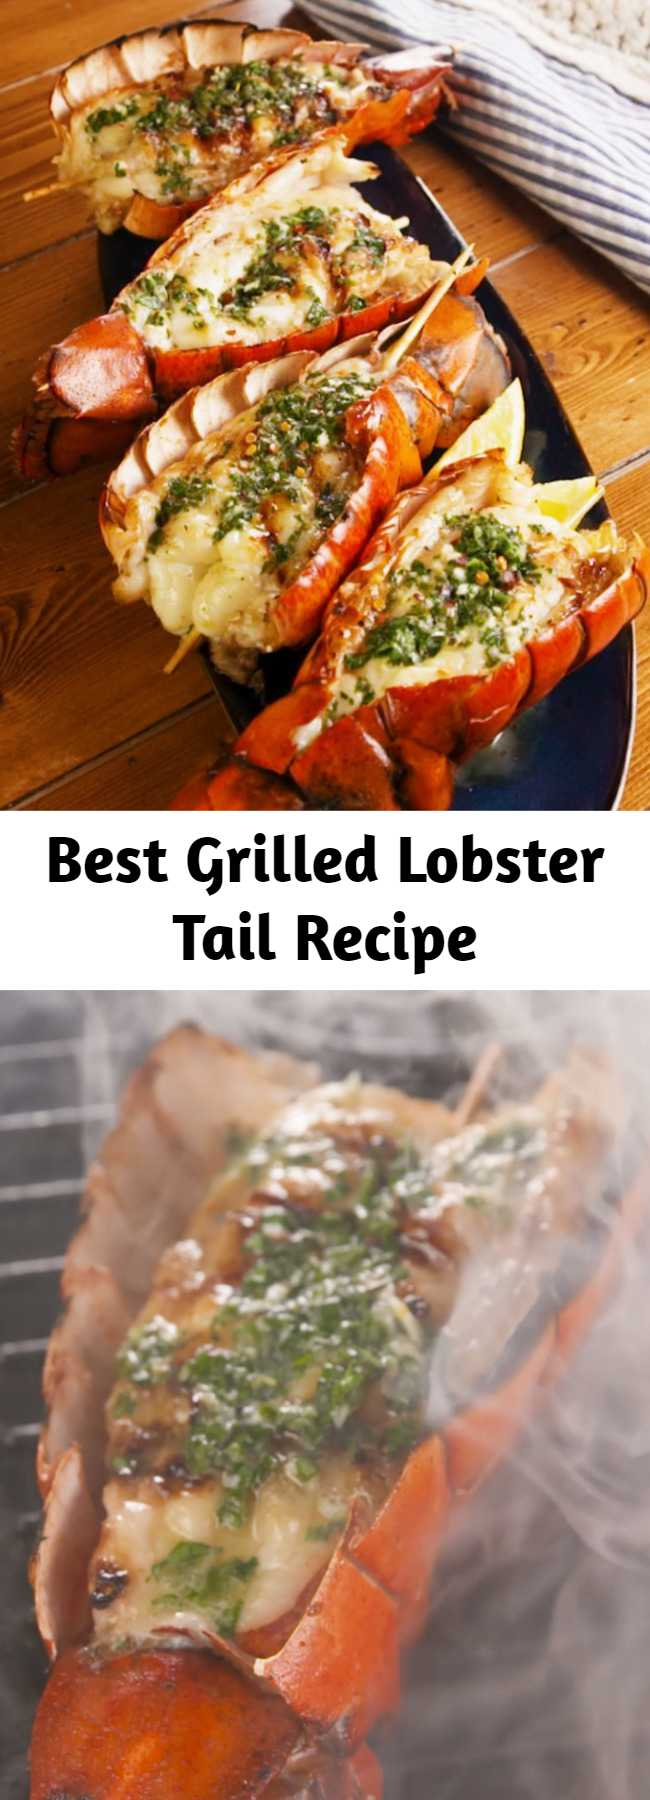 Best Grilled Lobster Tail Recipe – Mom Secret Ingrediets